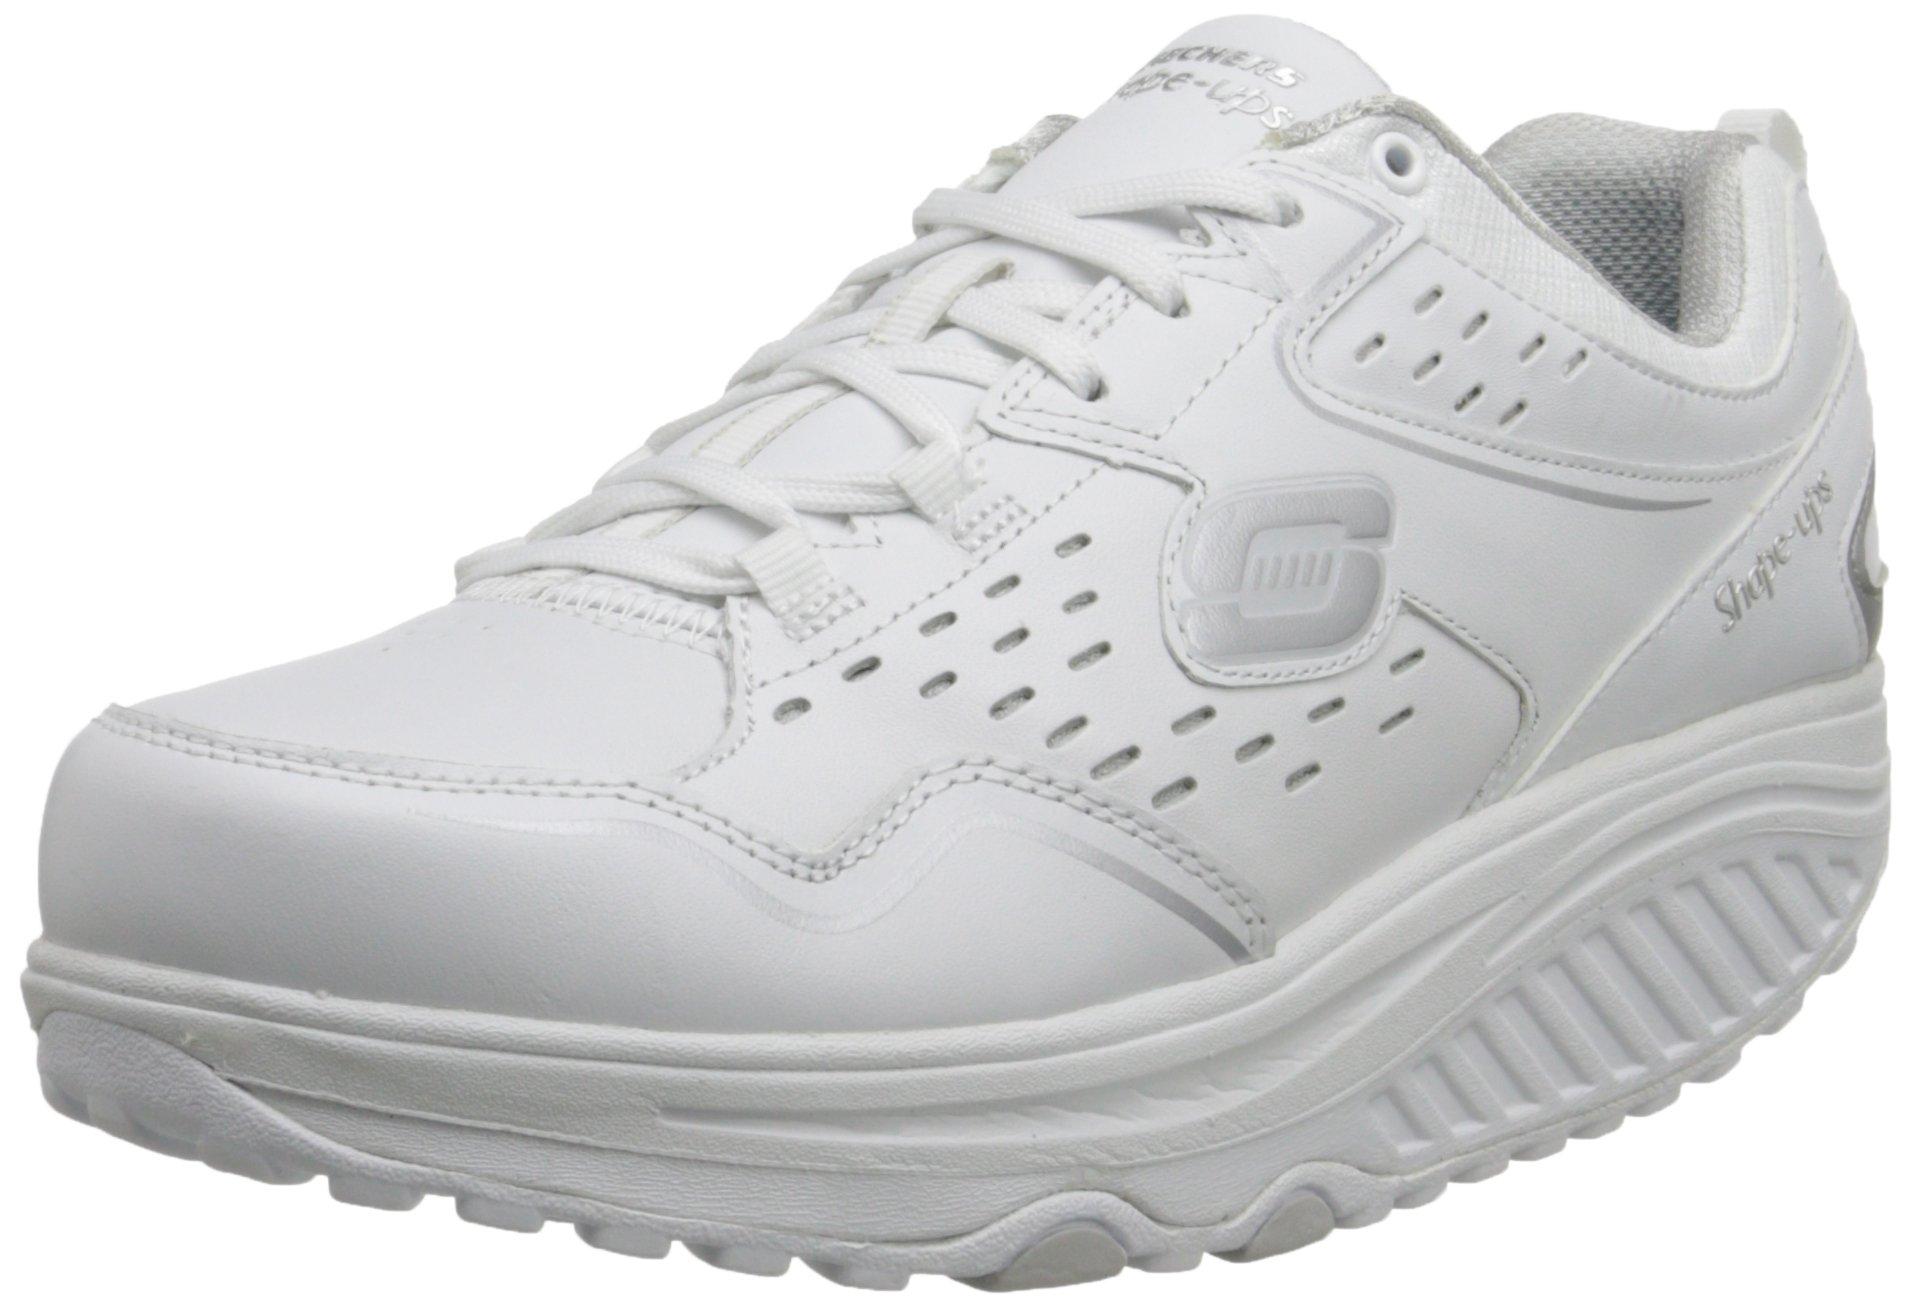 Skechers Women's Shape Ups 2.0 Perfect Comfort Fashion Sneaker, White/Silver, 9 M US